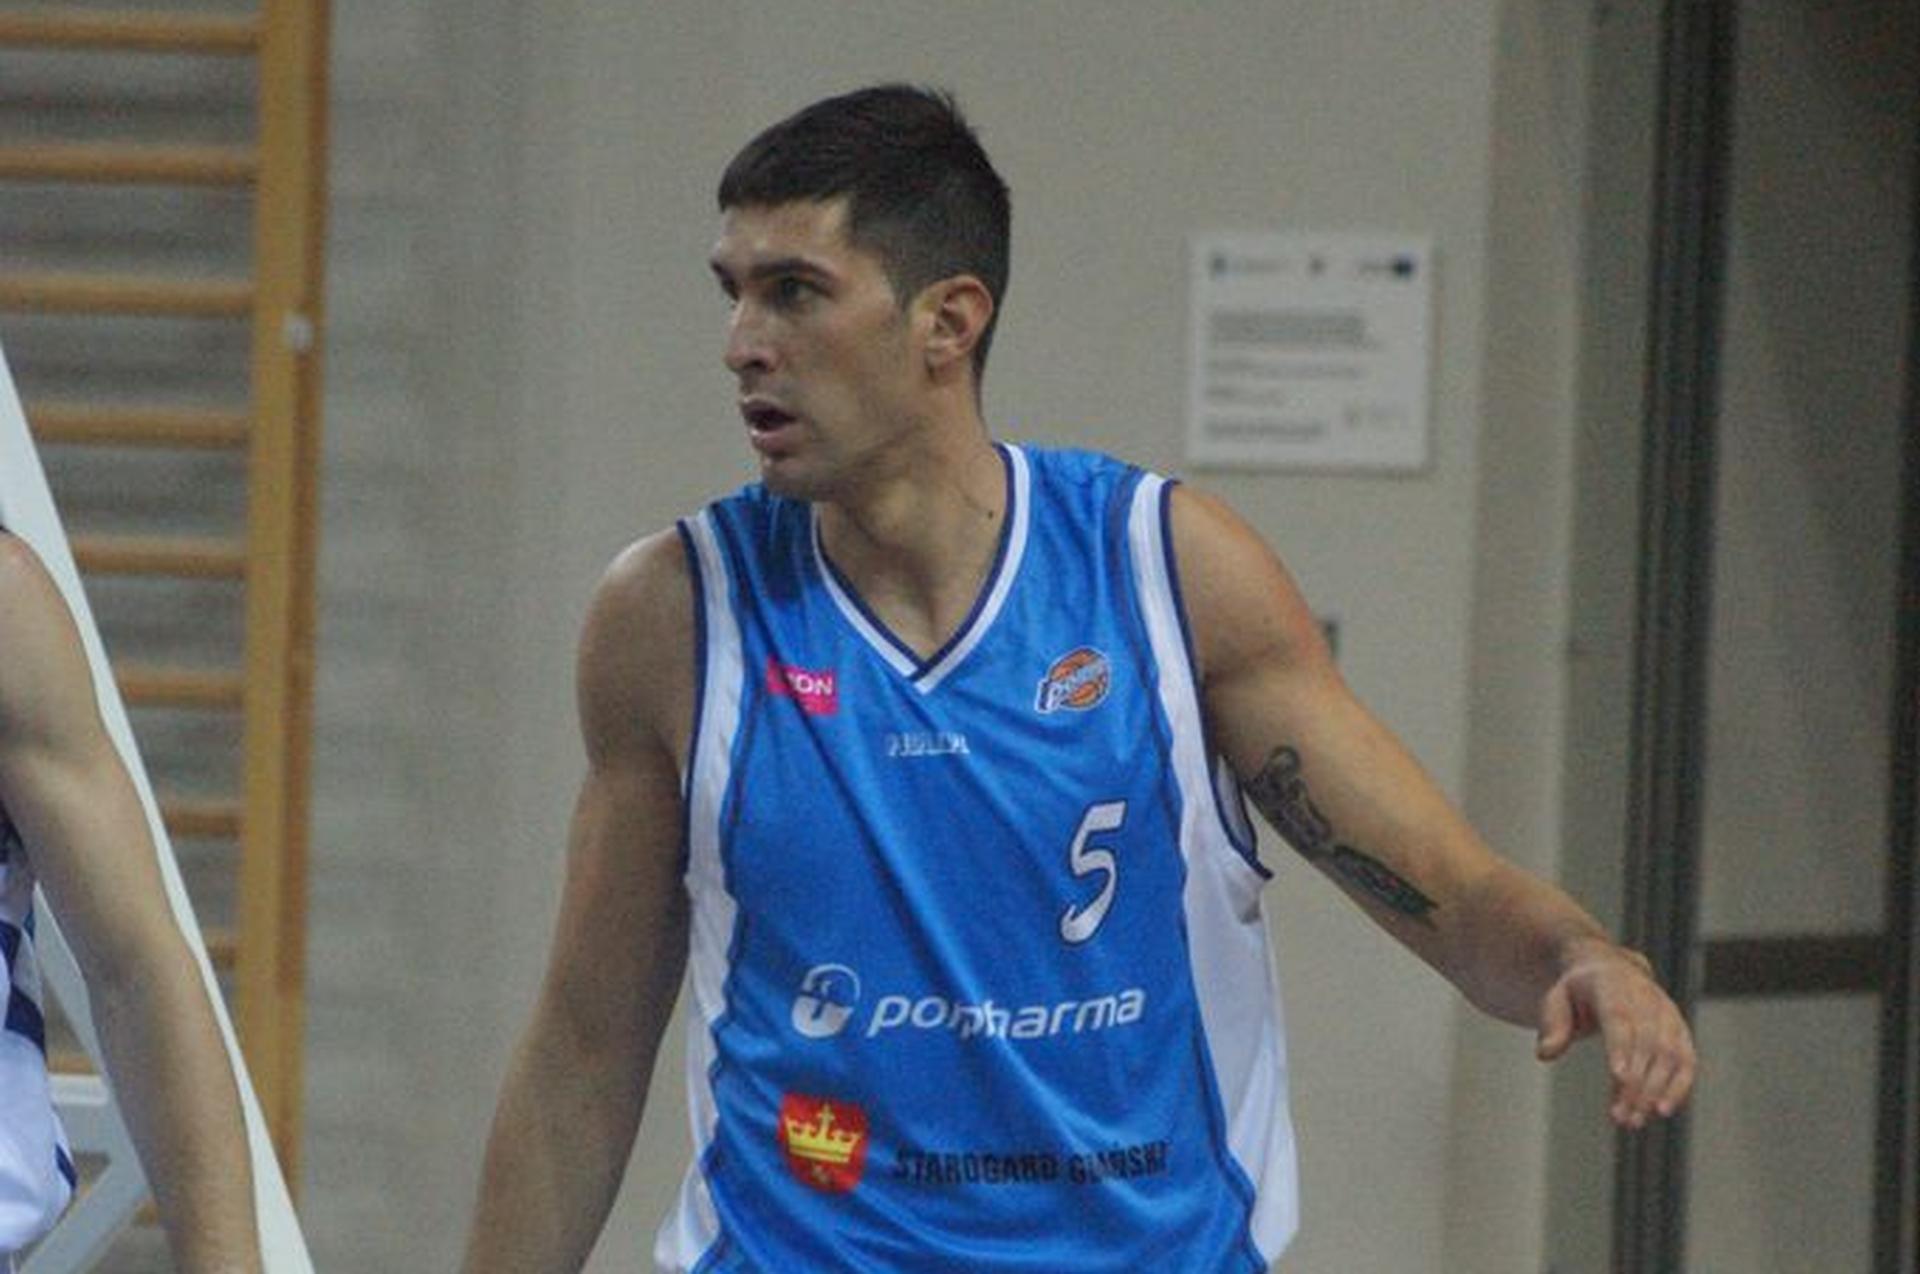 Nikola Jeftić